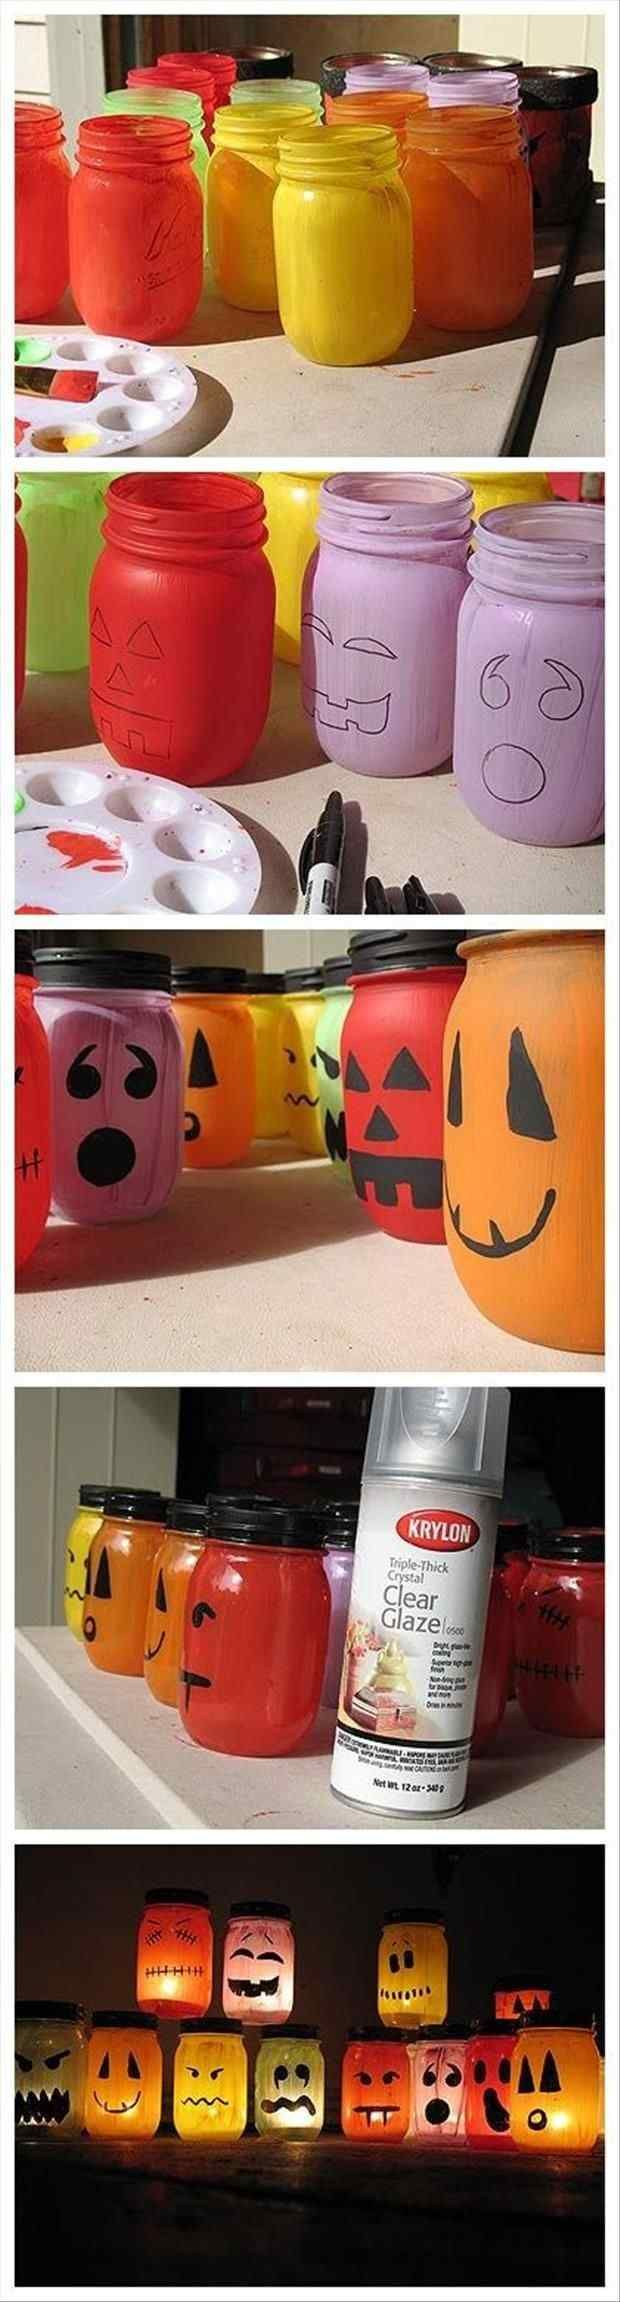 diy halloween deko anleitung marmeladengläser bunte kerzenlichter gesichter